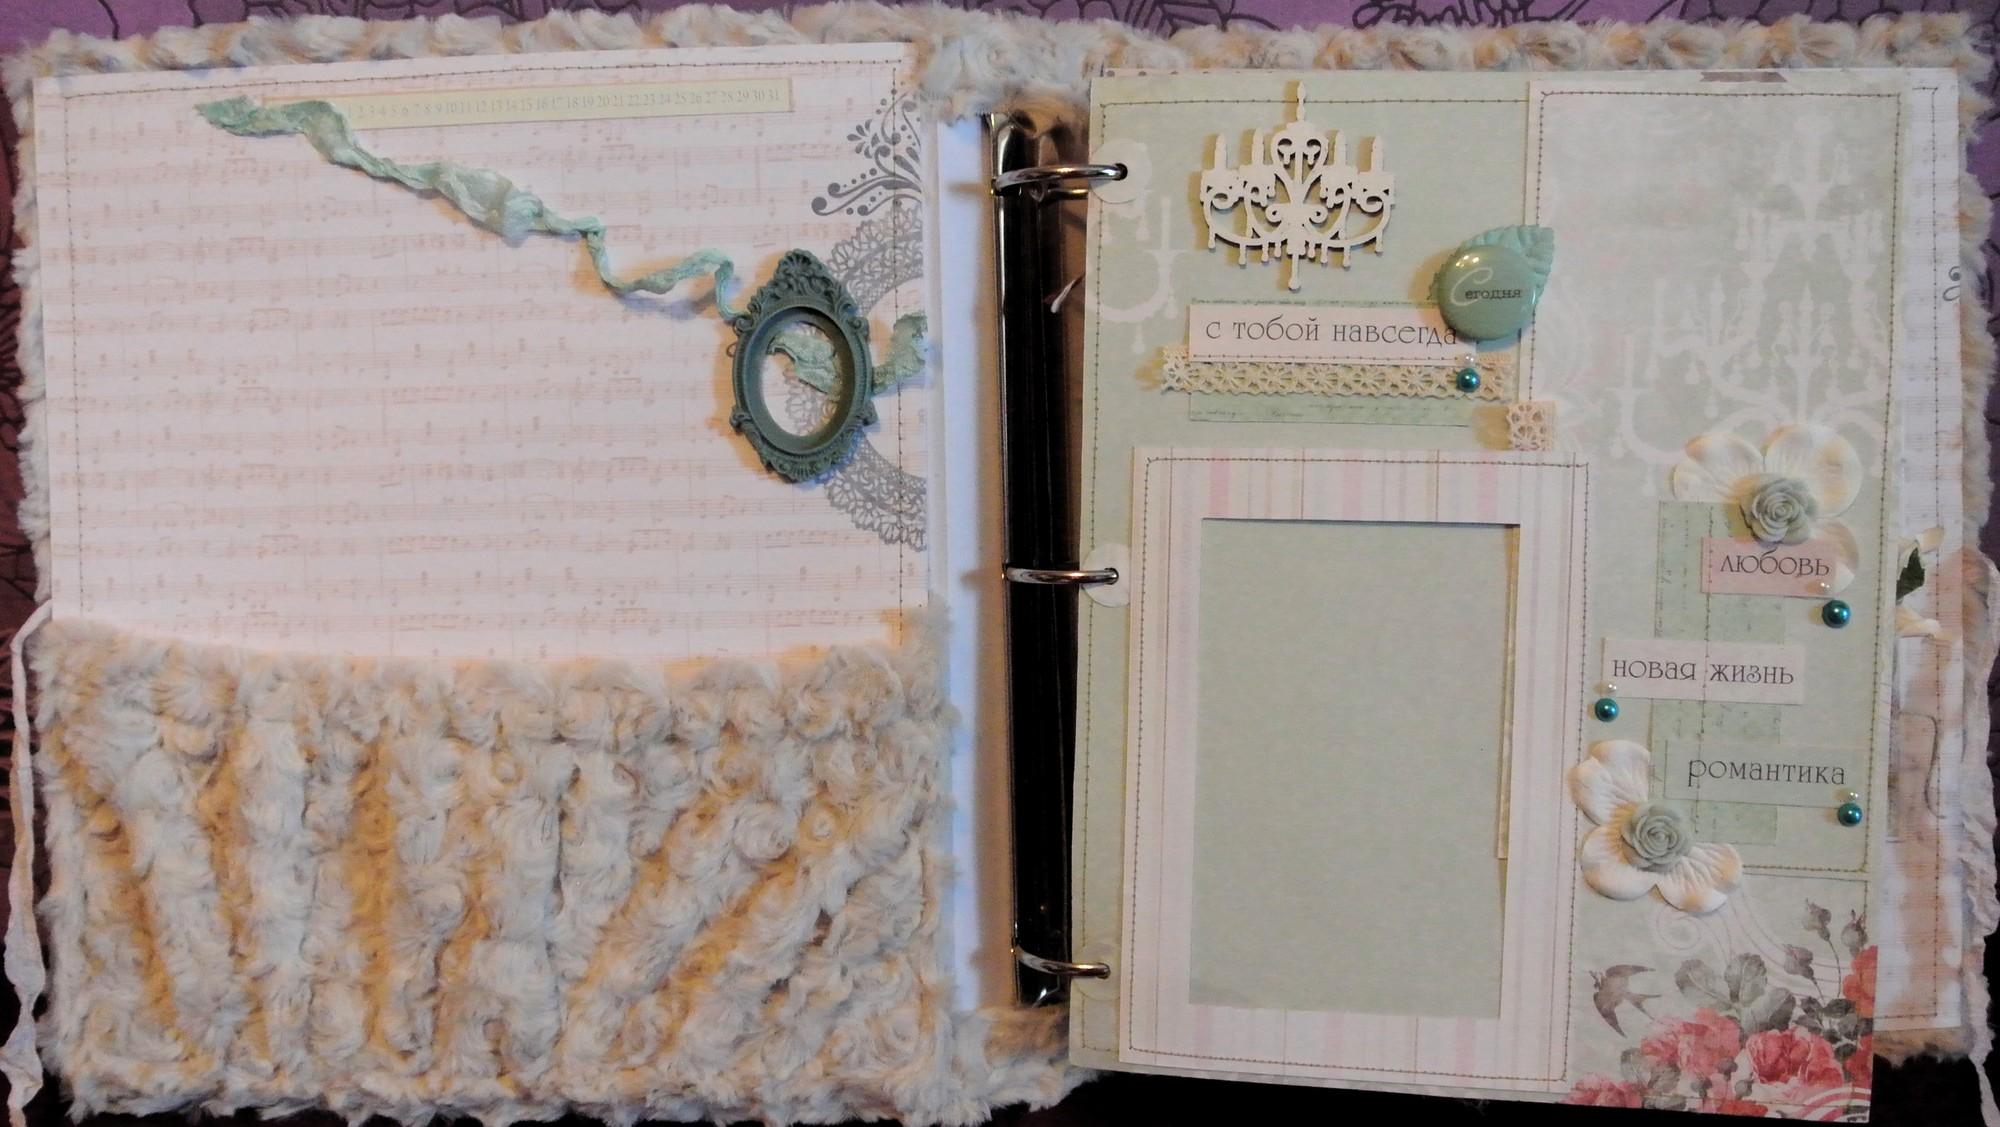 Картинки для свадебного альбома своими руками фото 504